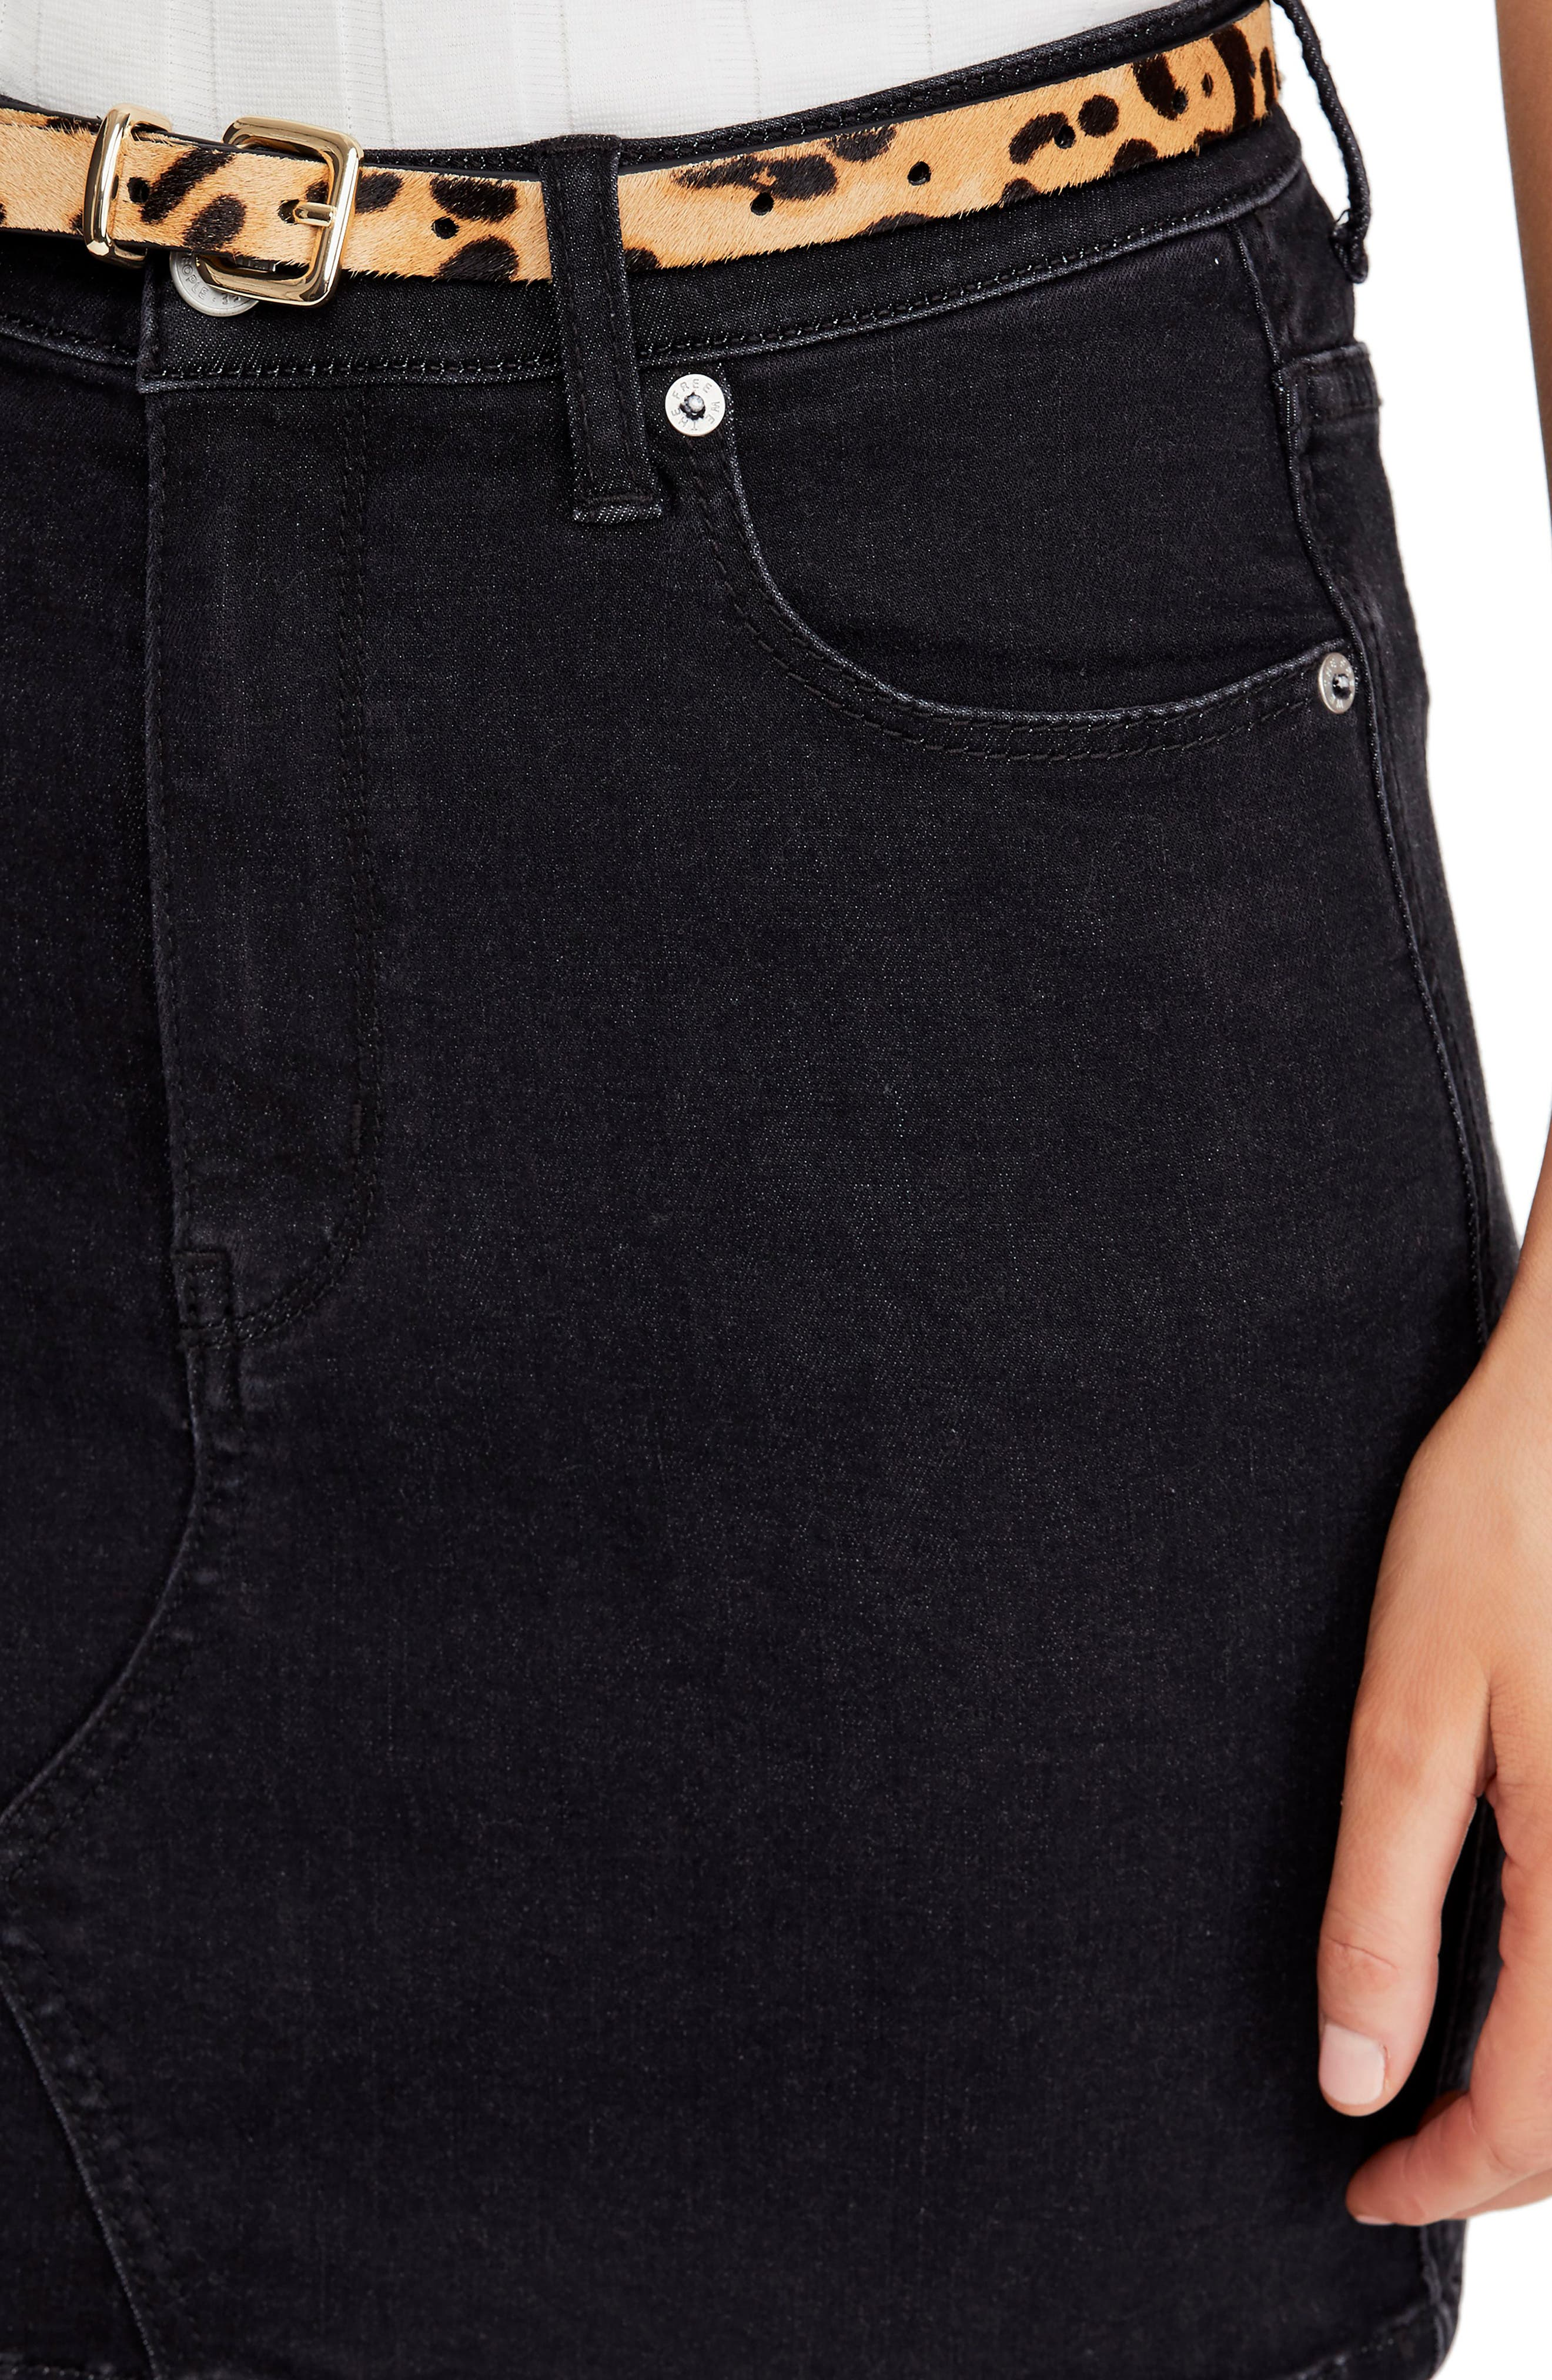 FREE PEOPLE, Teagan Denim Miniskirt, Alternate thumbnail 5, color, BLACK